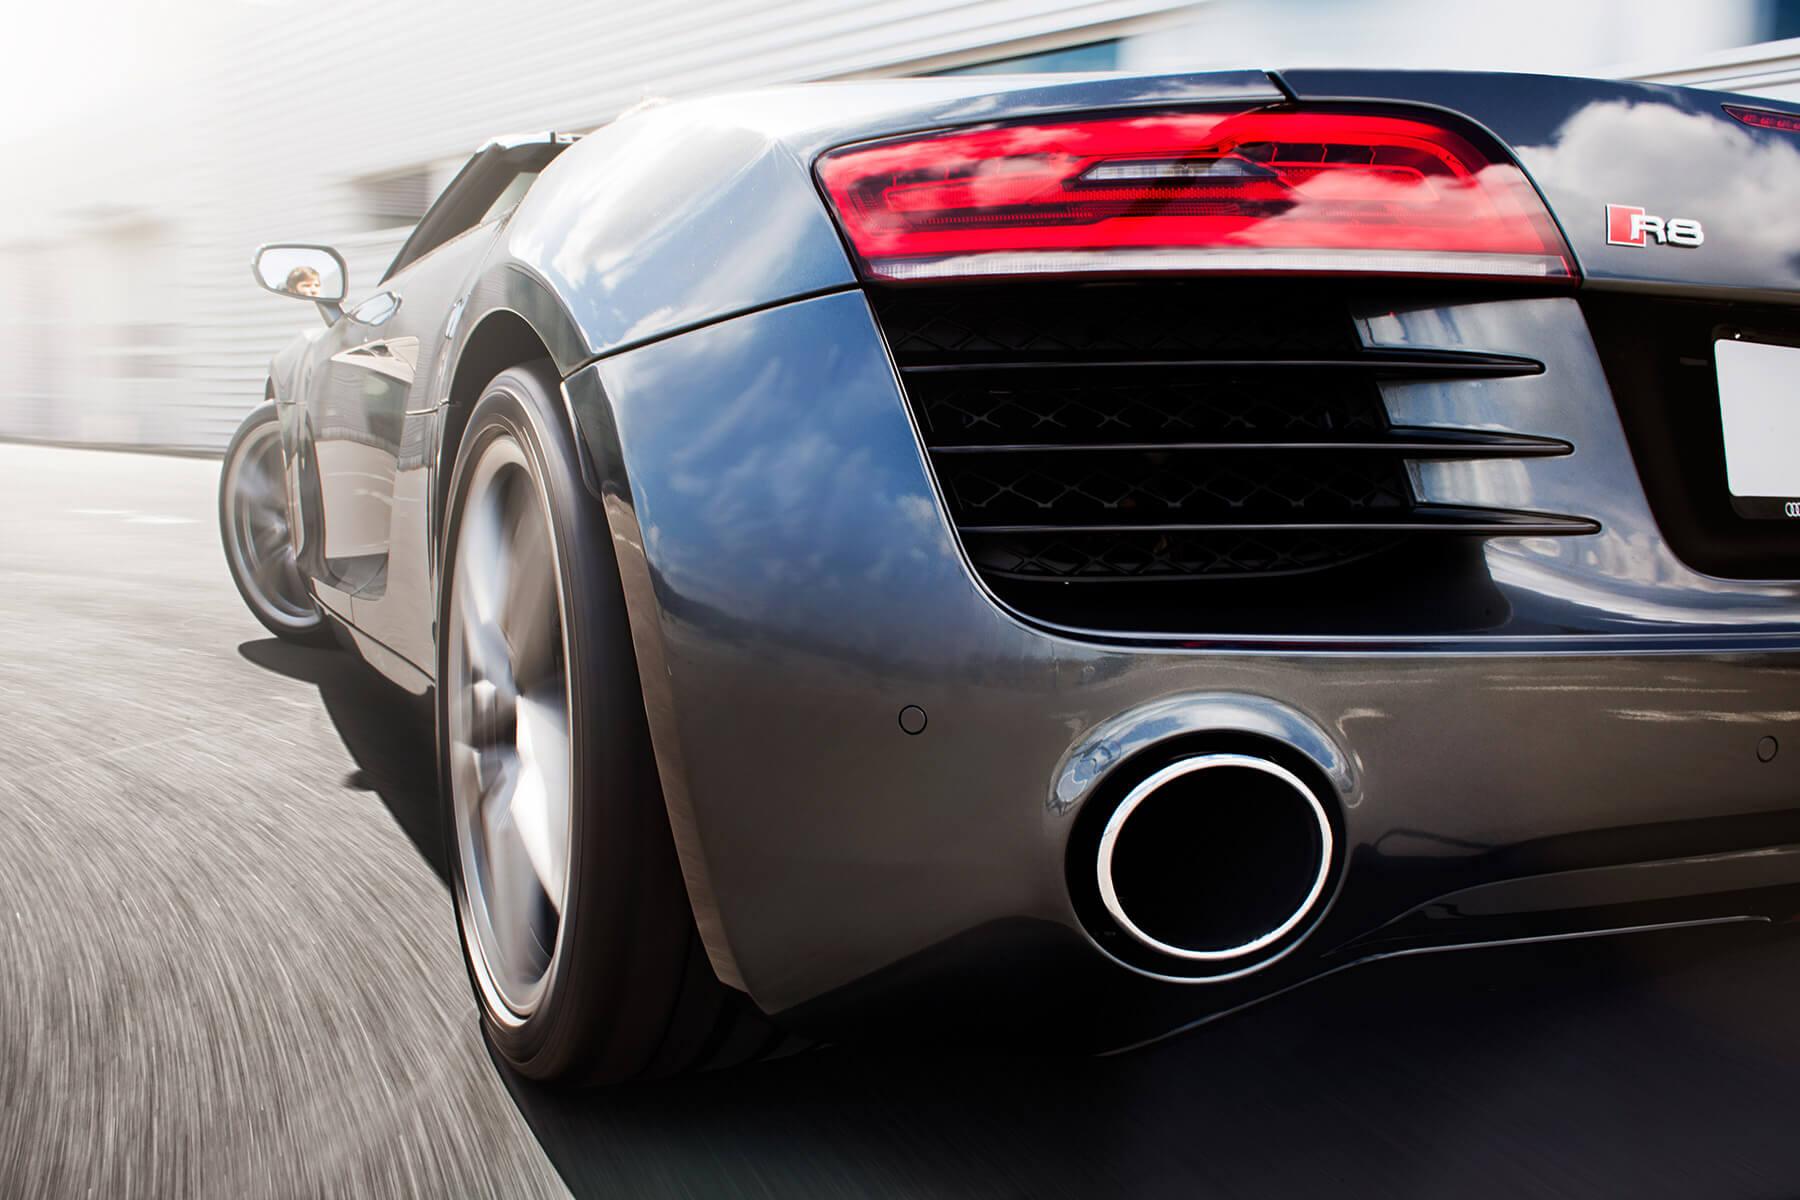 Audi R8 V10 Spyder rear 02